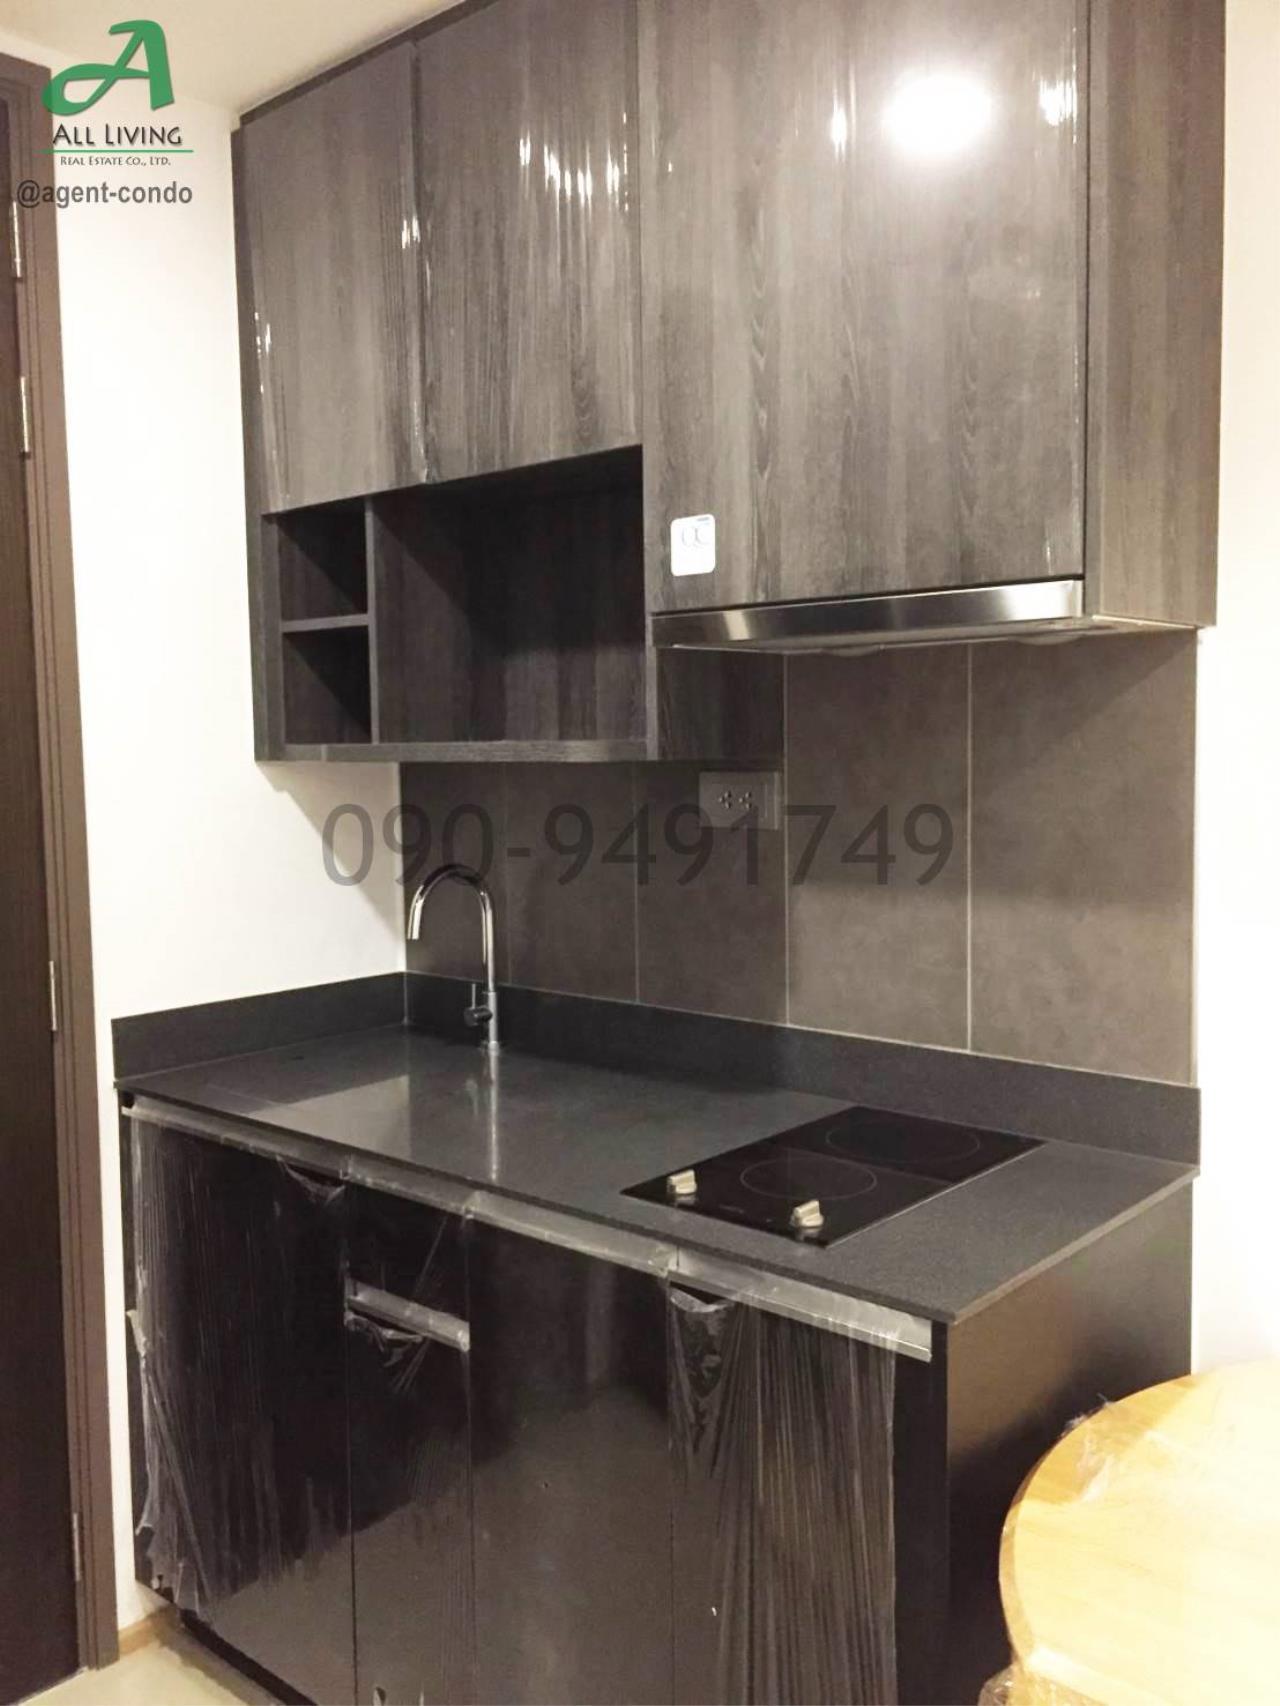 All Living Real Estate Co., Ltd Agency's Ashton Chula-Silom 9